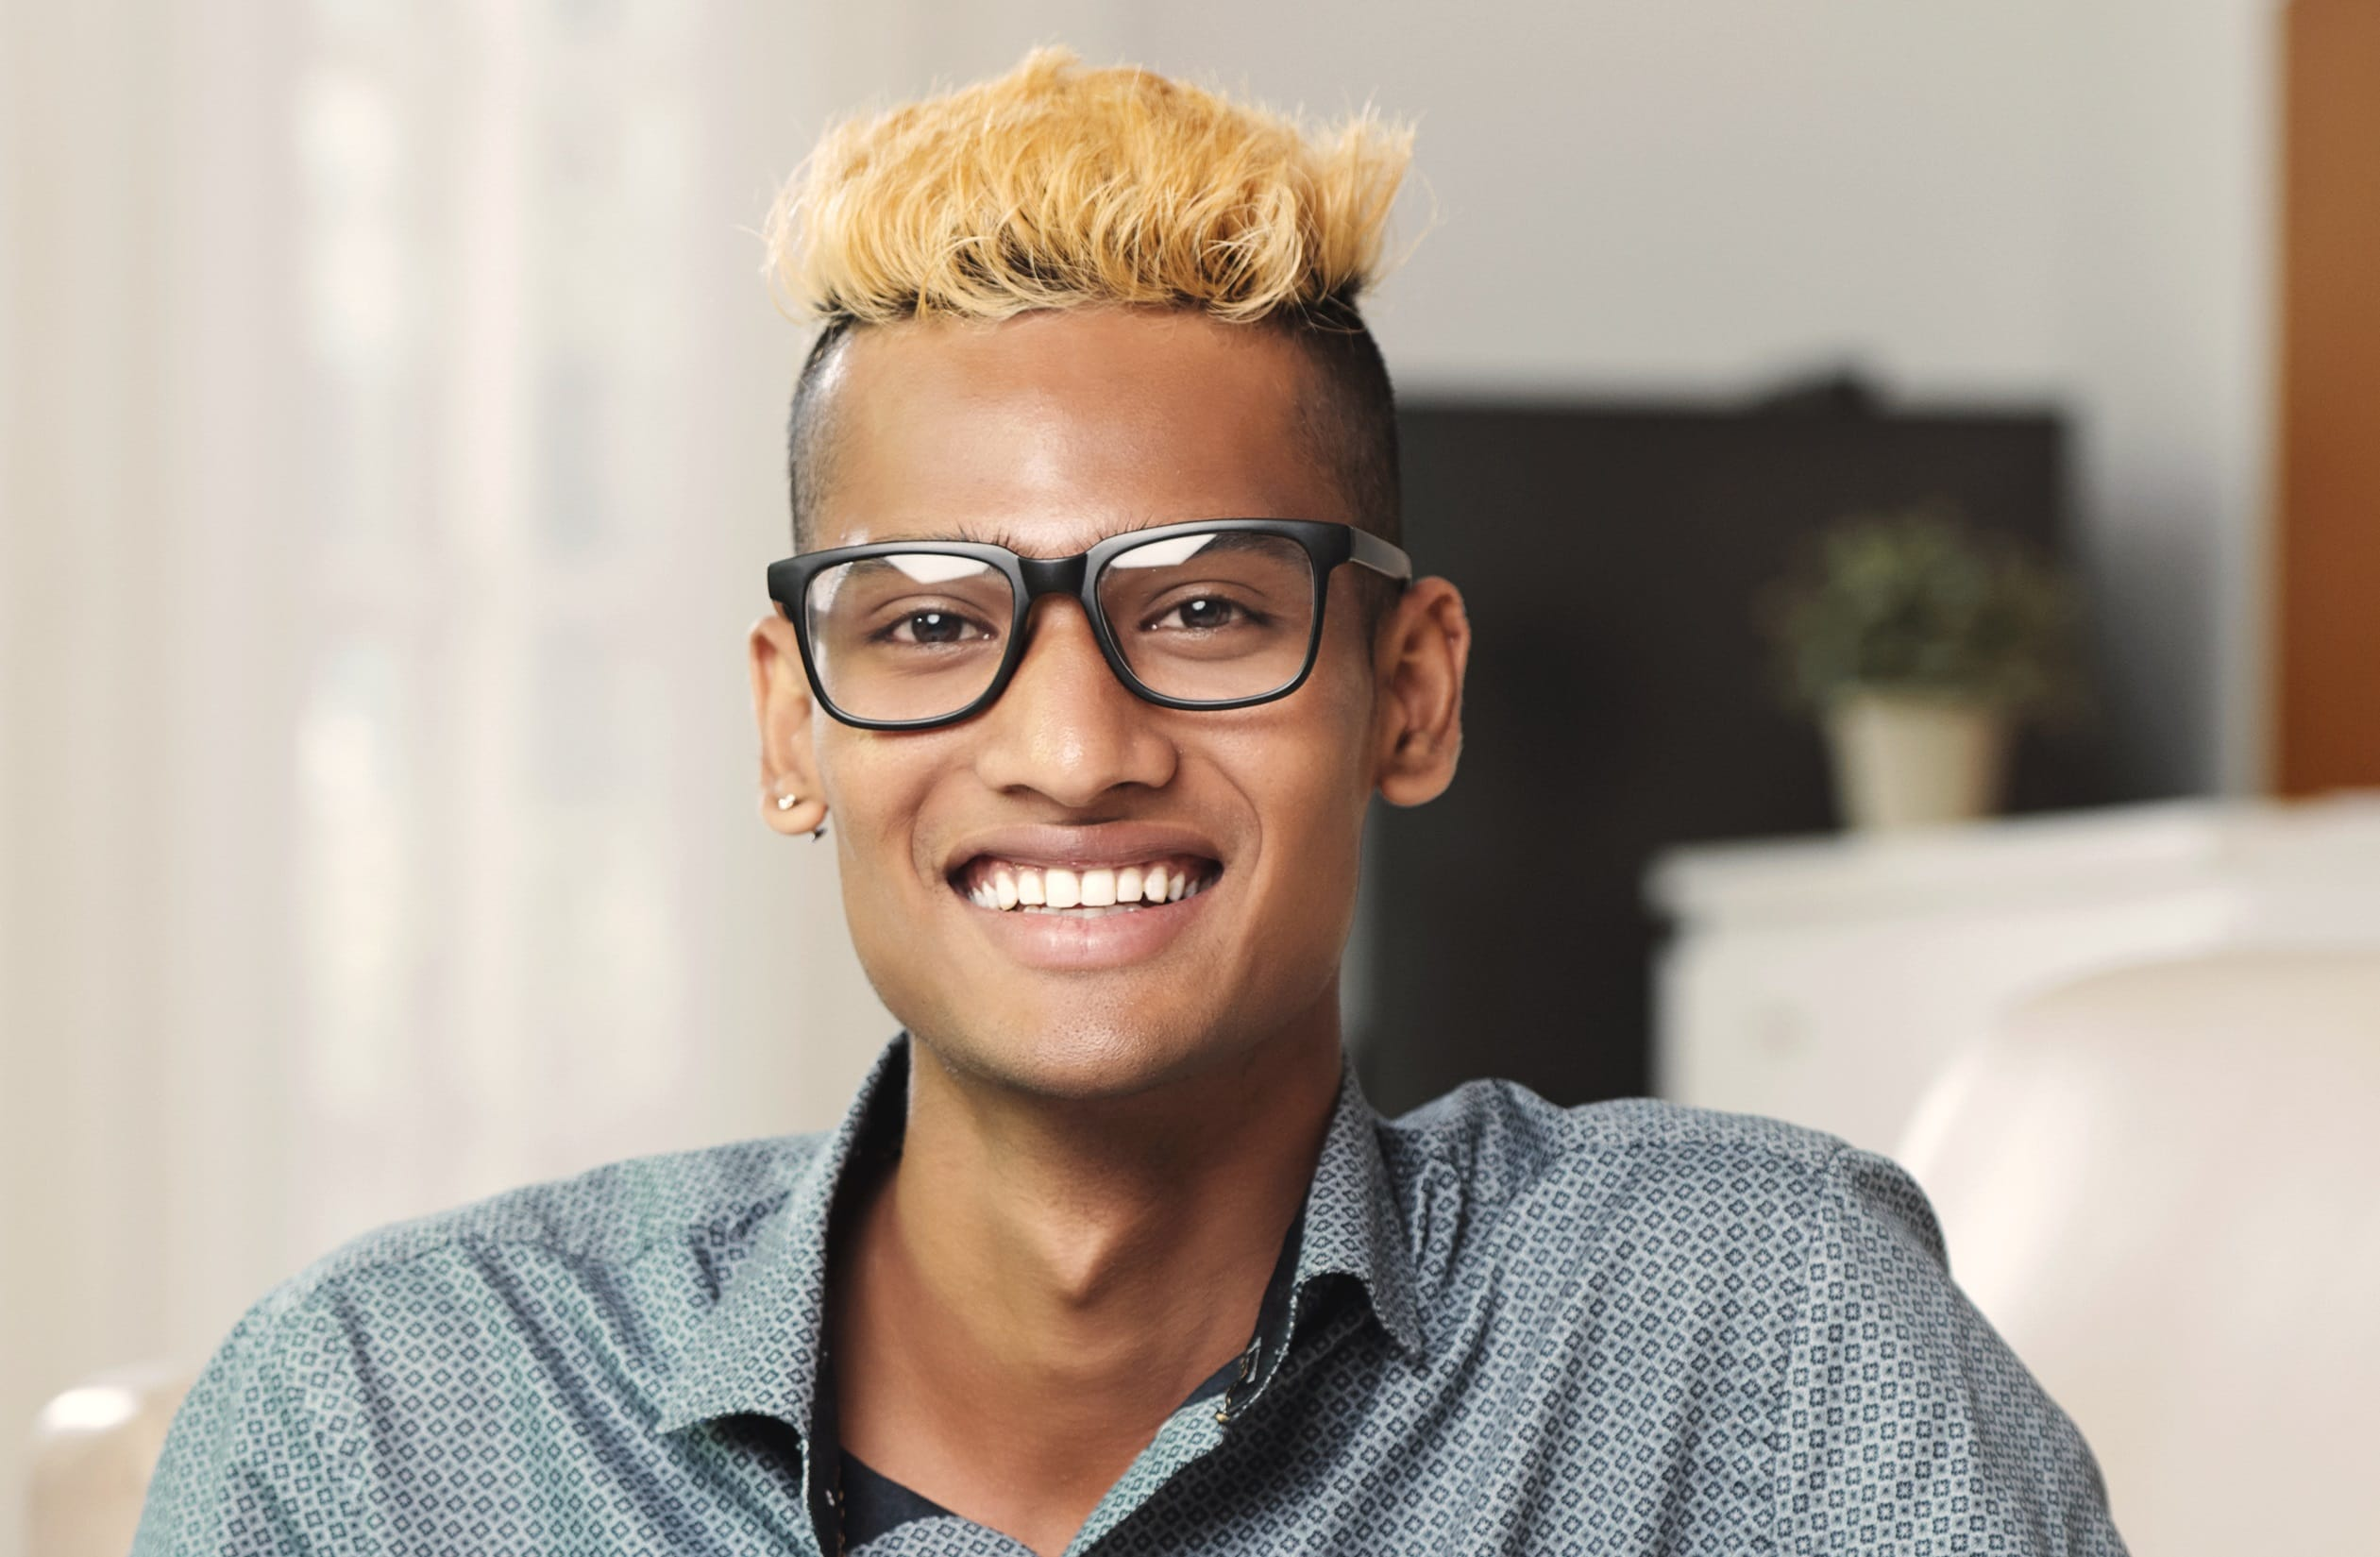 black guy with short blonde hair